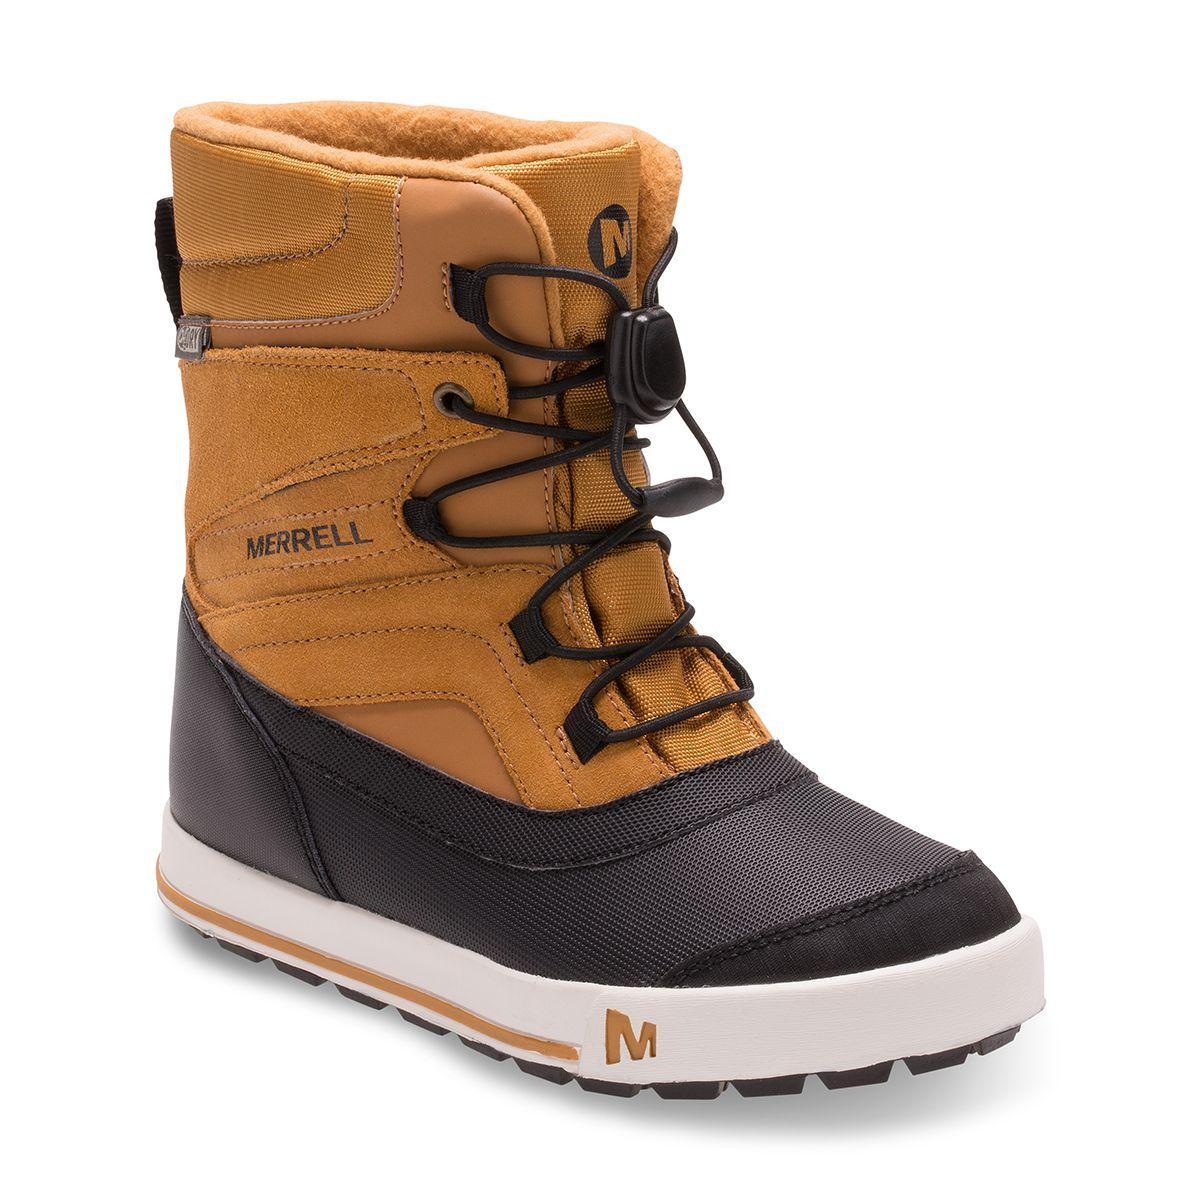 fd6639b4d26253 Doorout Angebote Merrell Snow Bank 2.0 Waterproof Kinderschuhe  wheat black